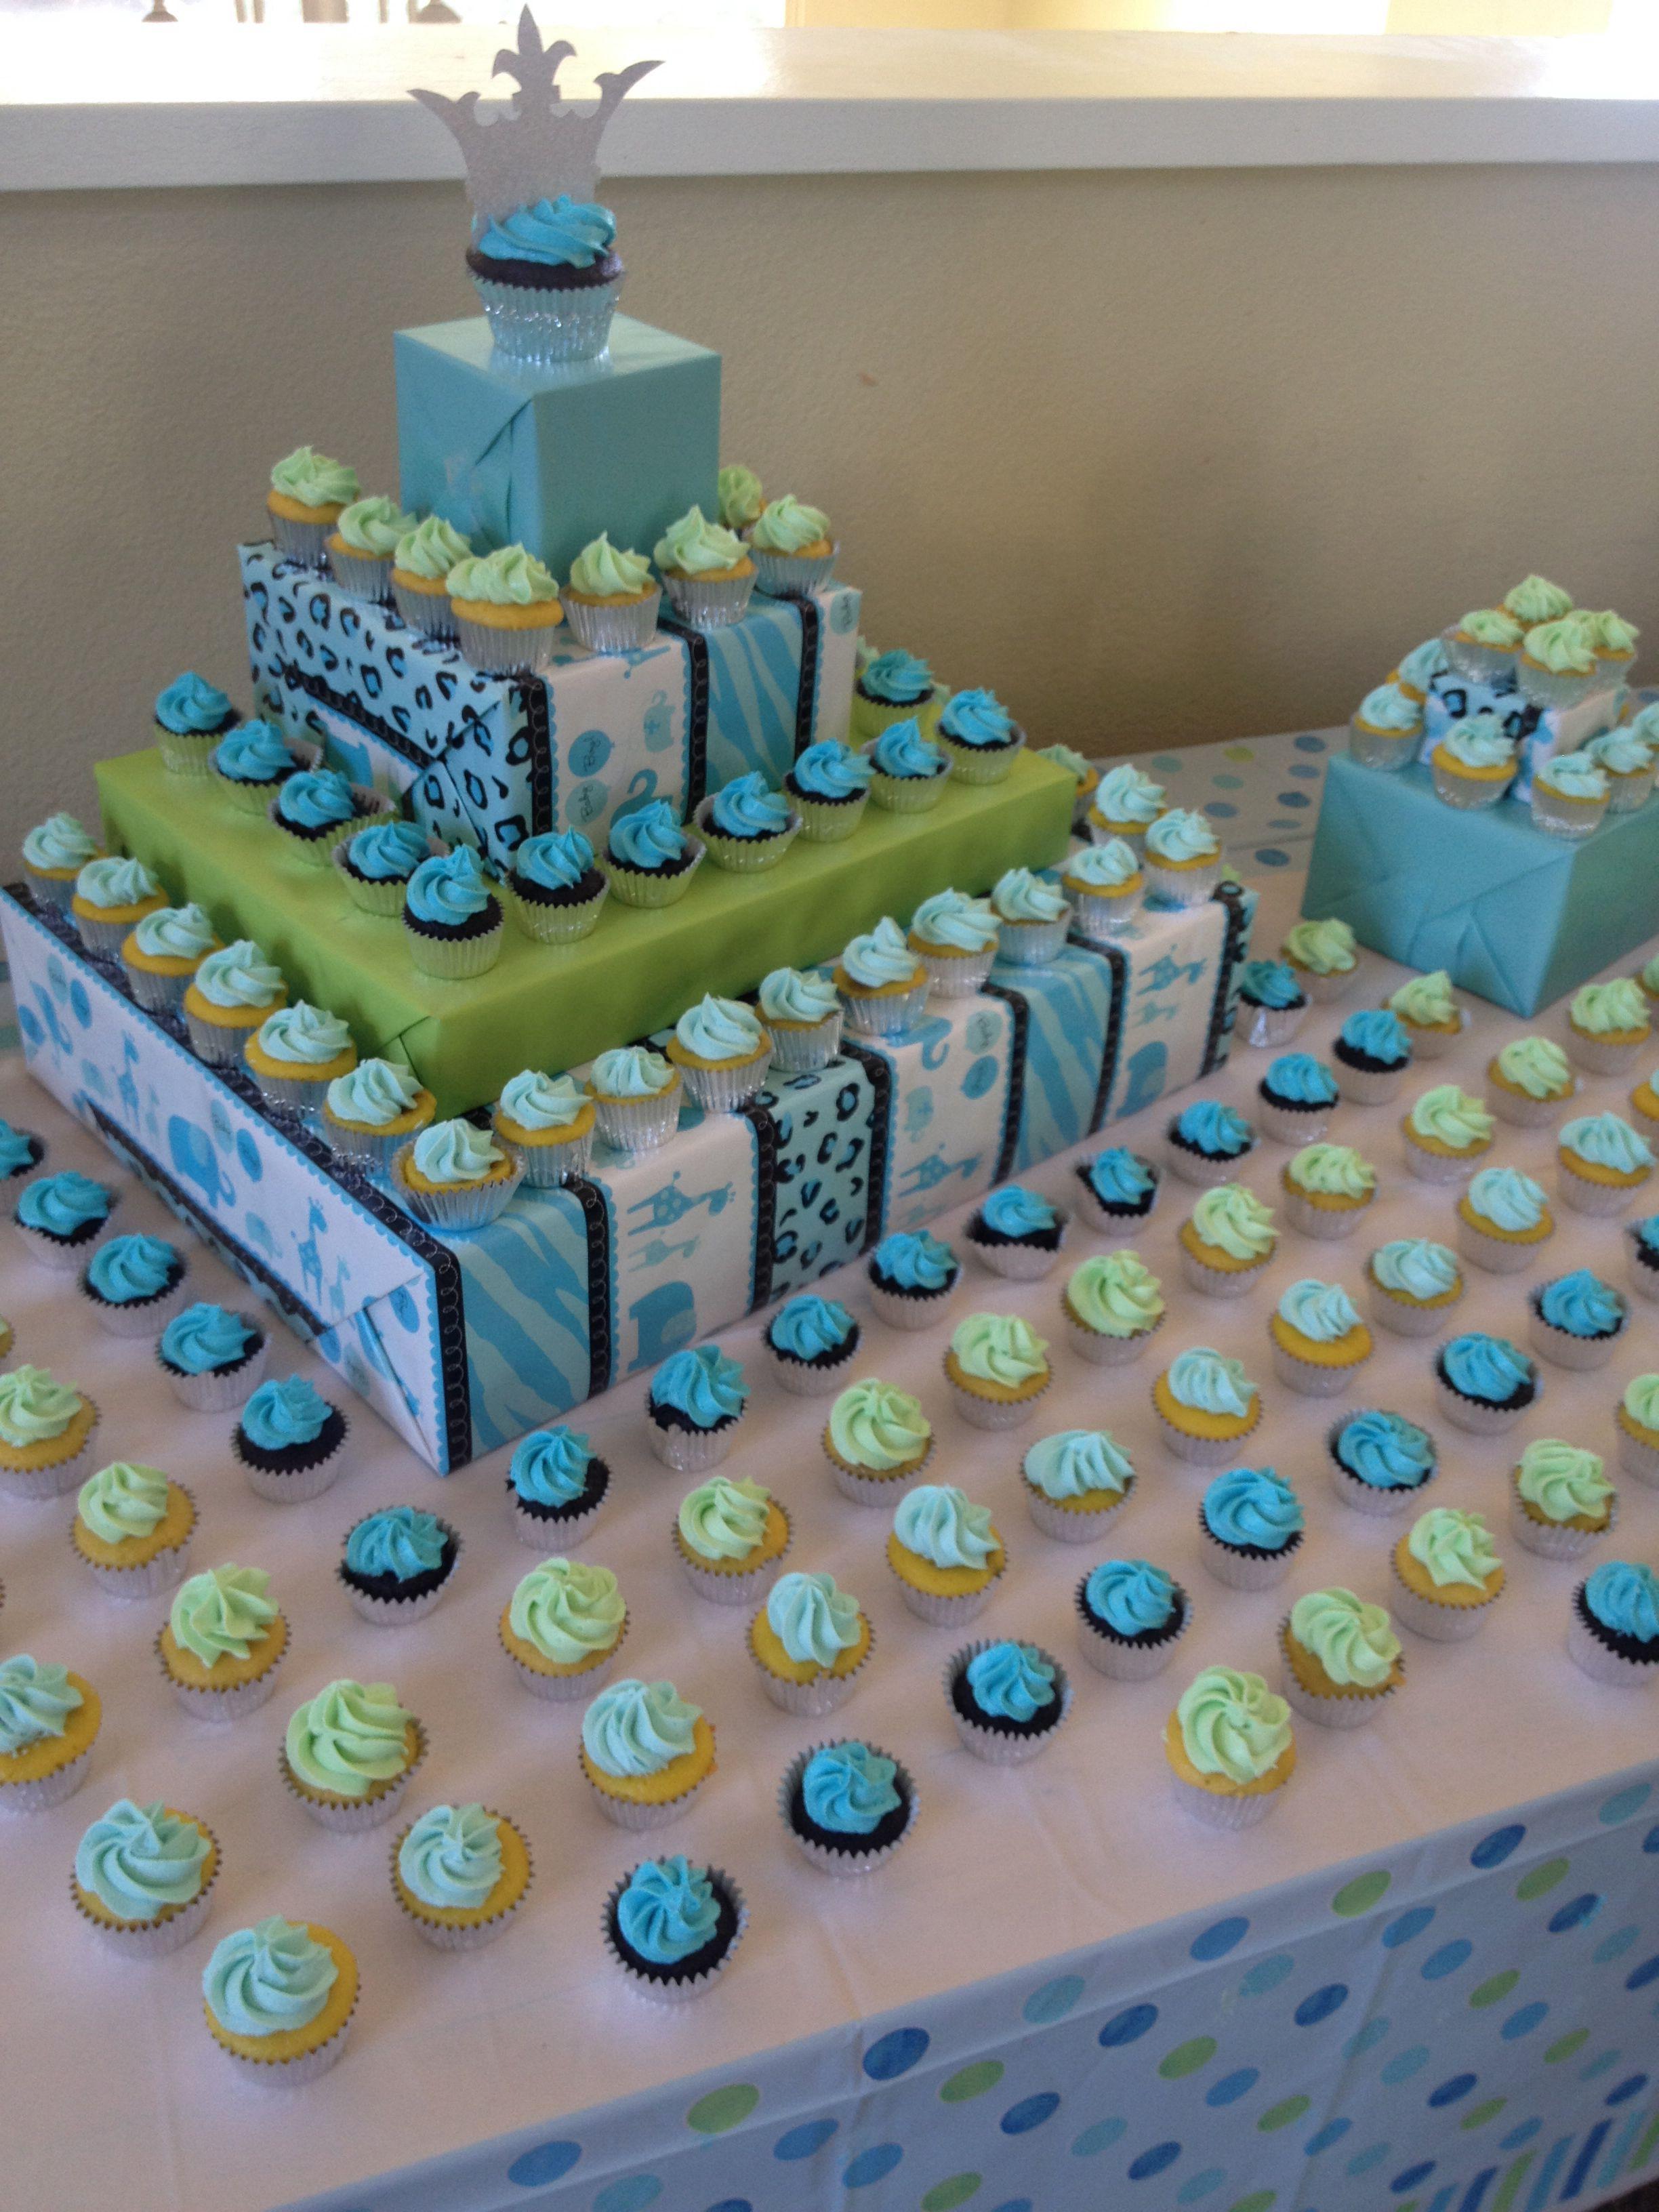 Cupcake Display Diy Cupcakes Babyshower Cupcake Display Diy